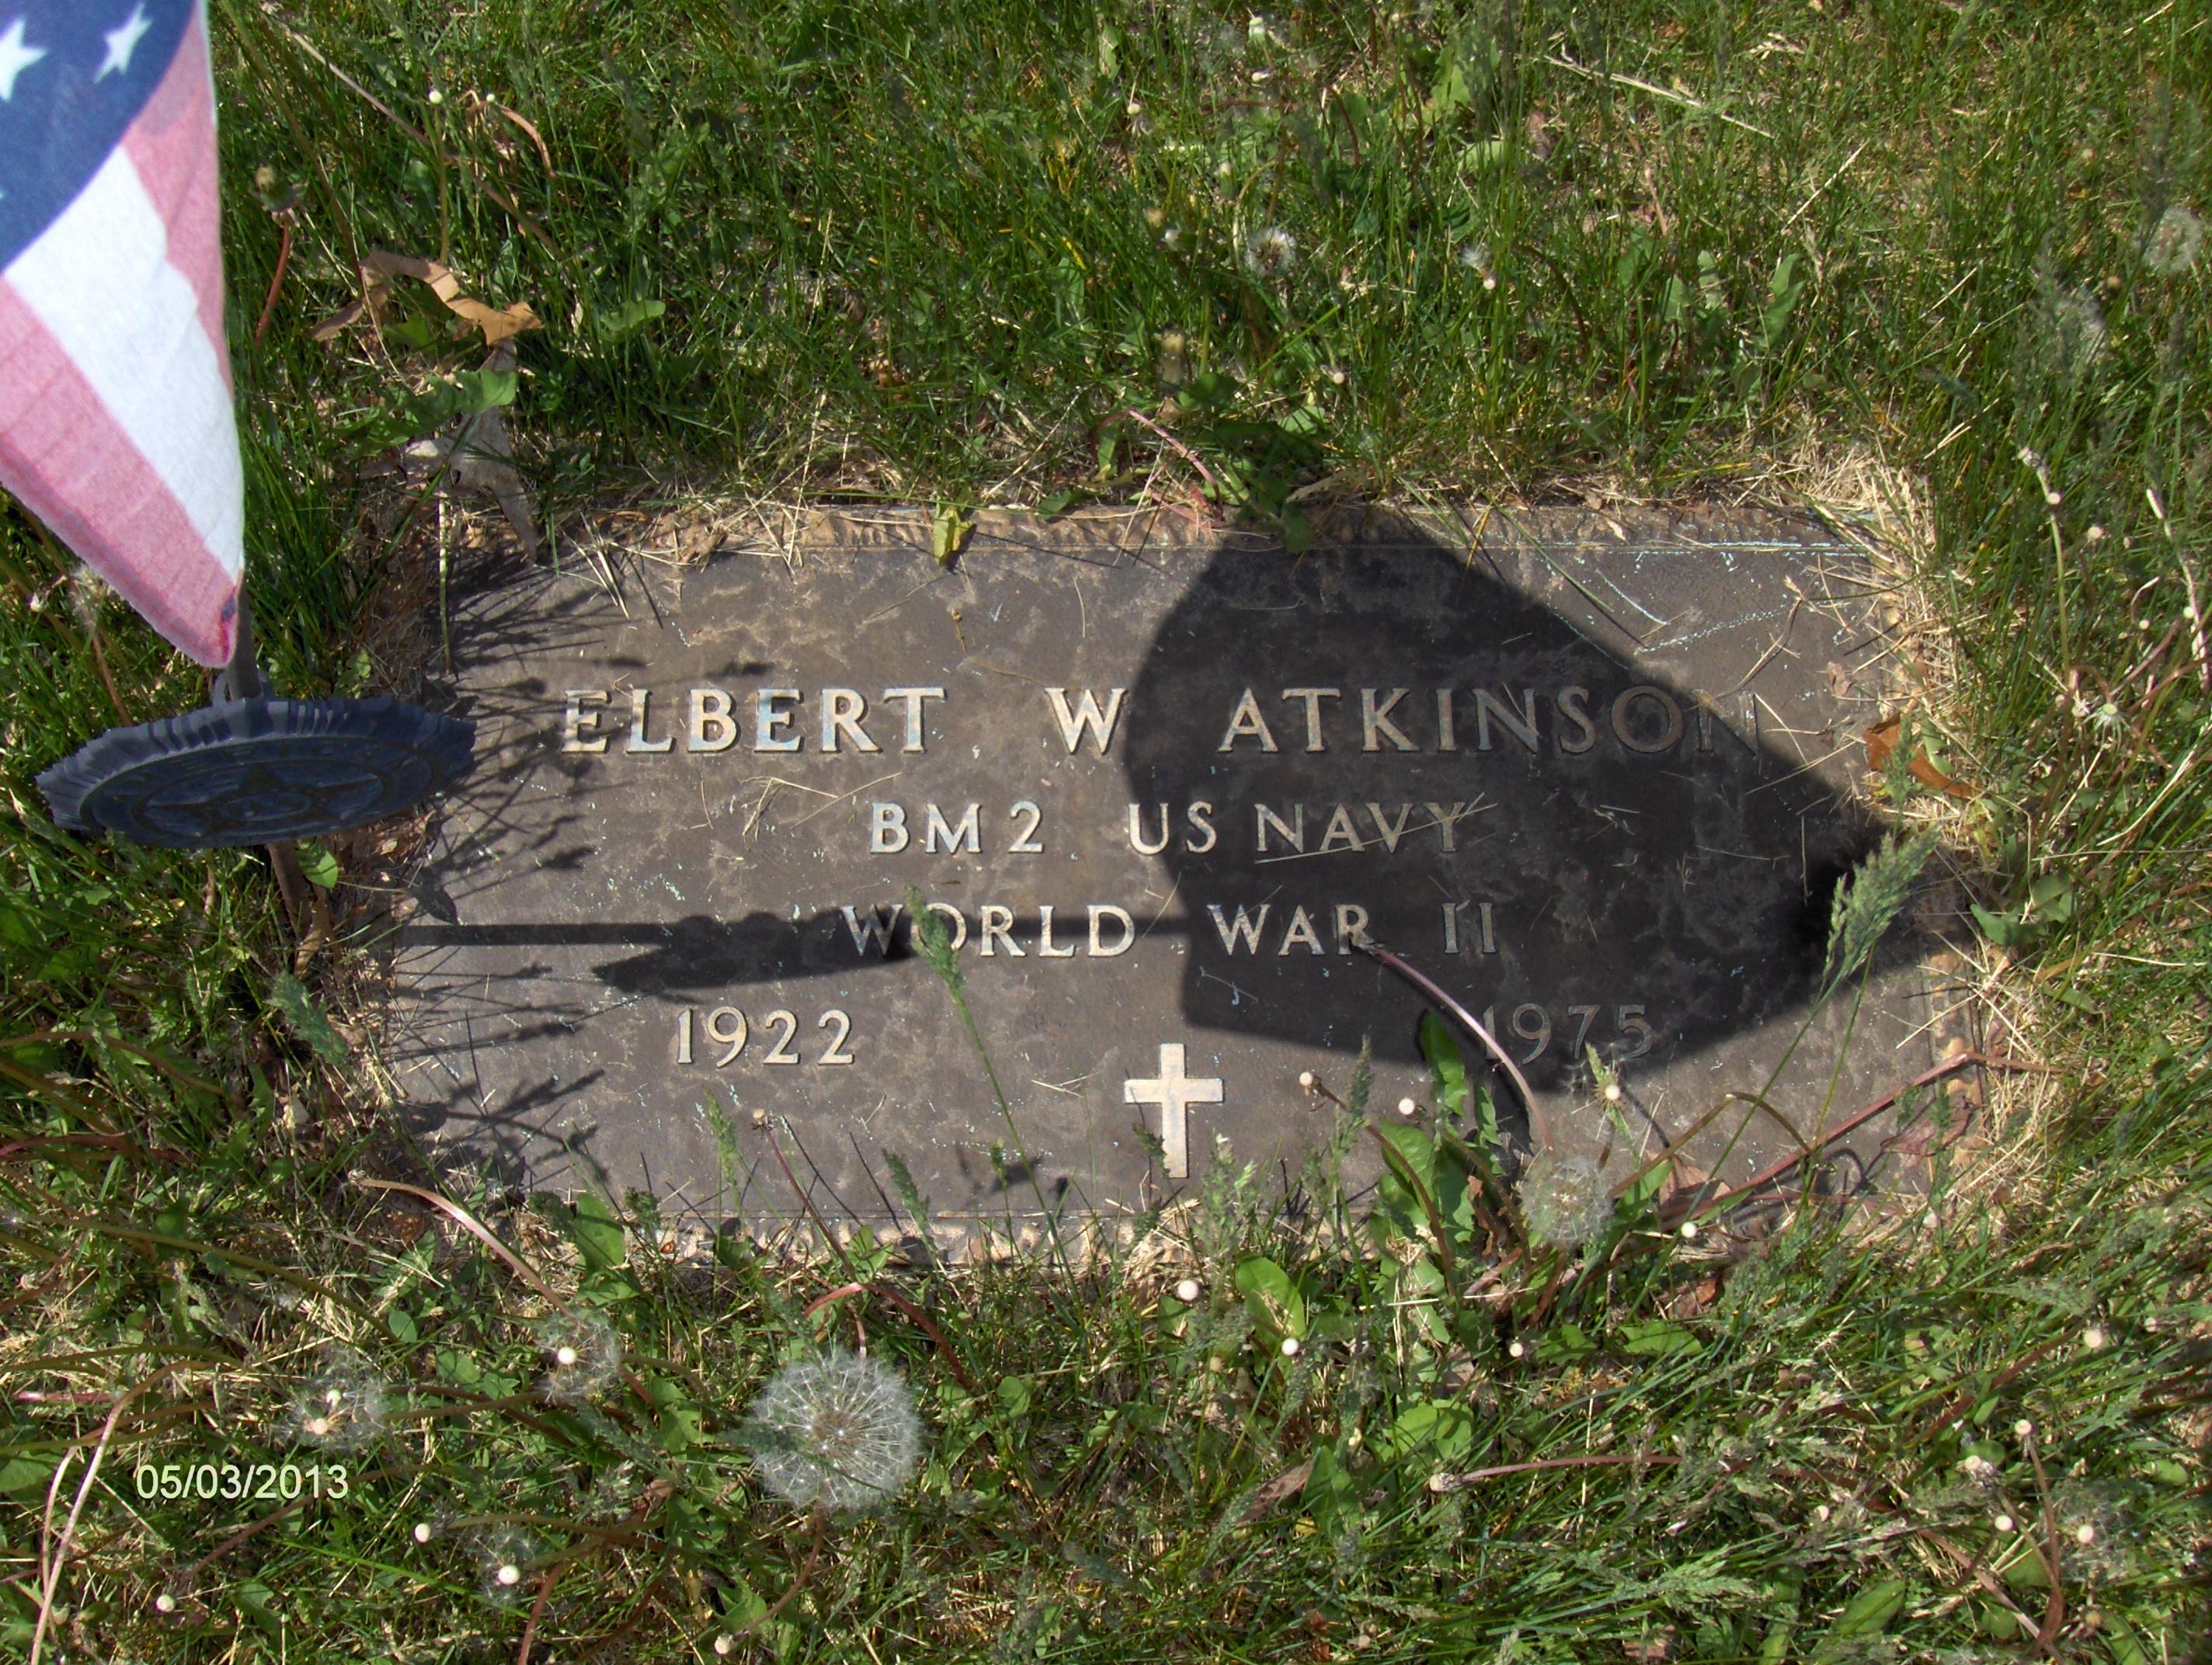 Elbert W. Atkinson